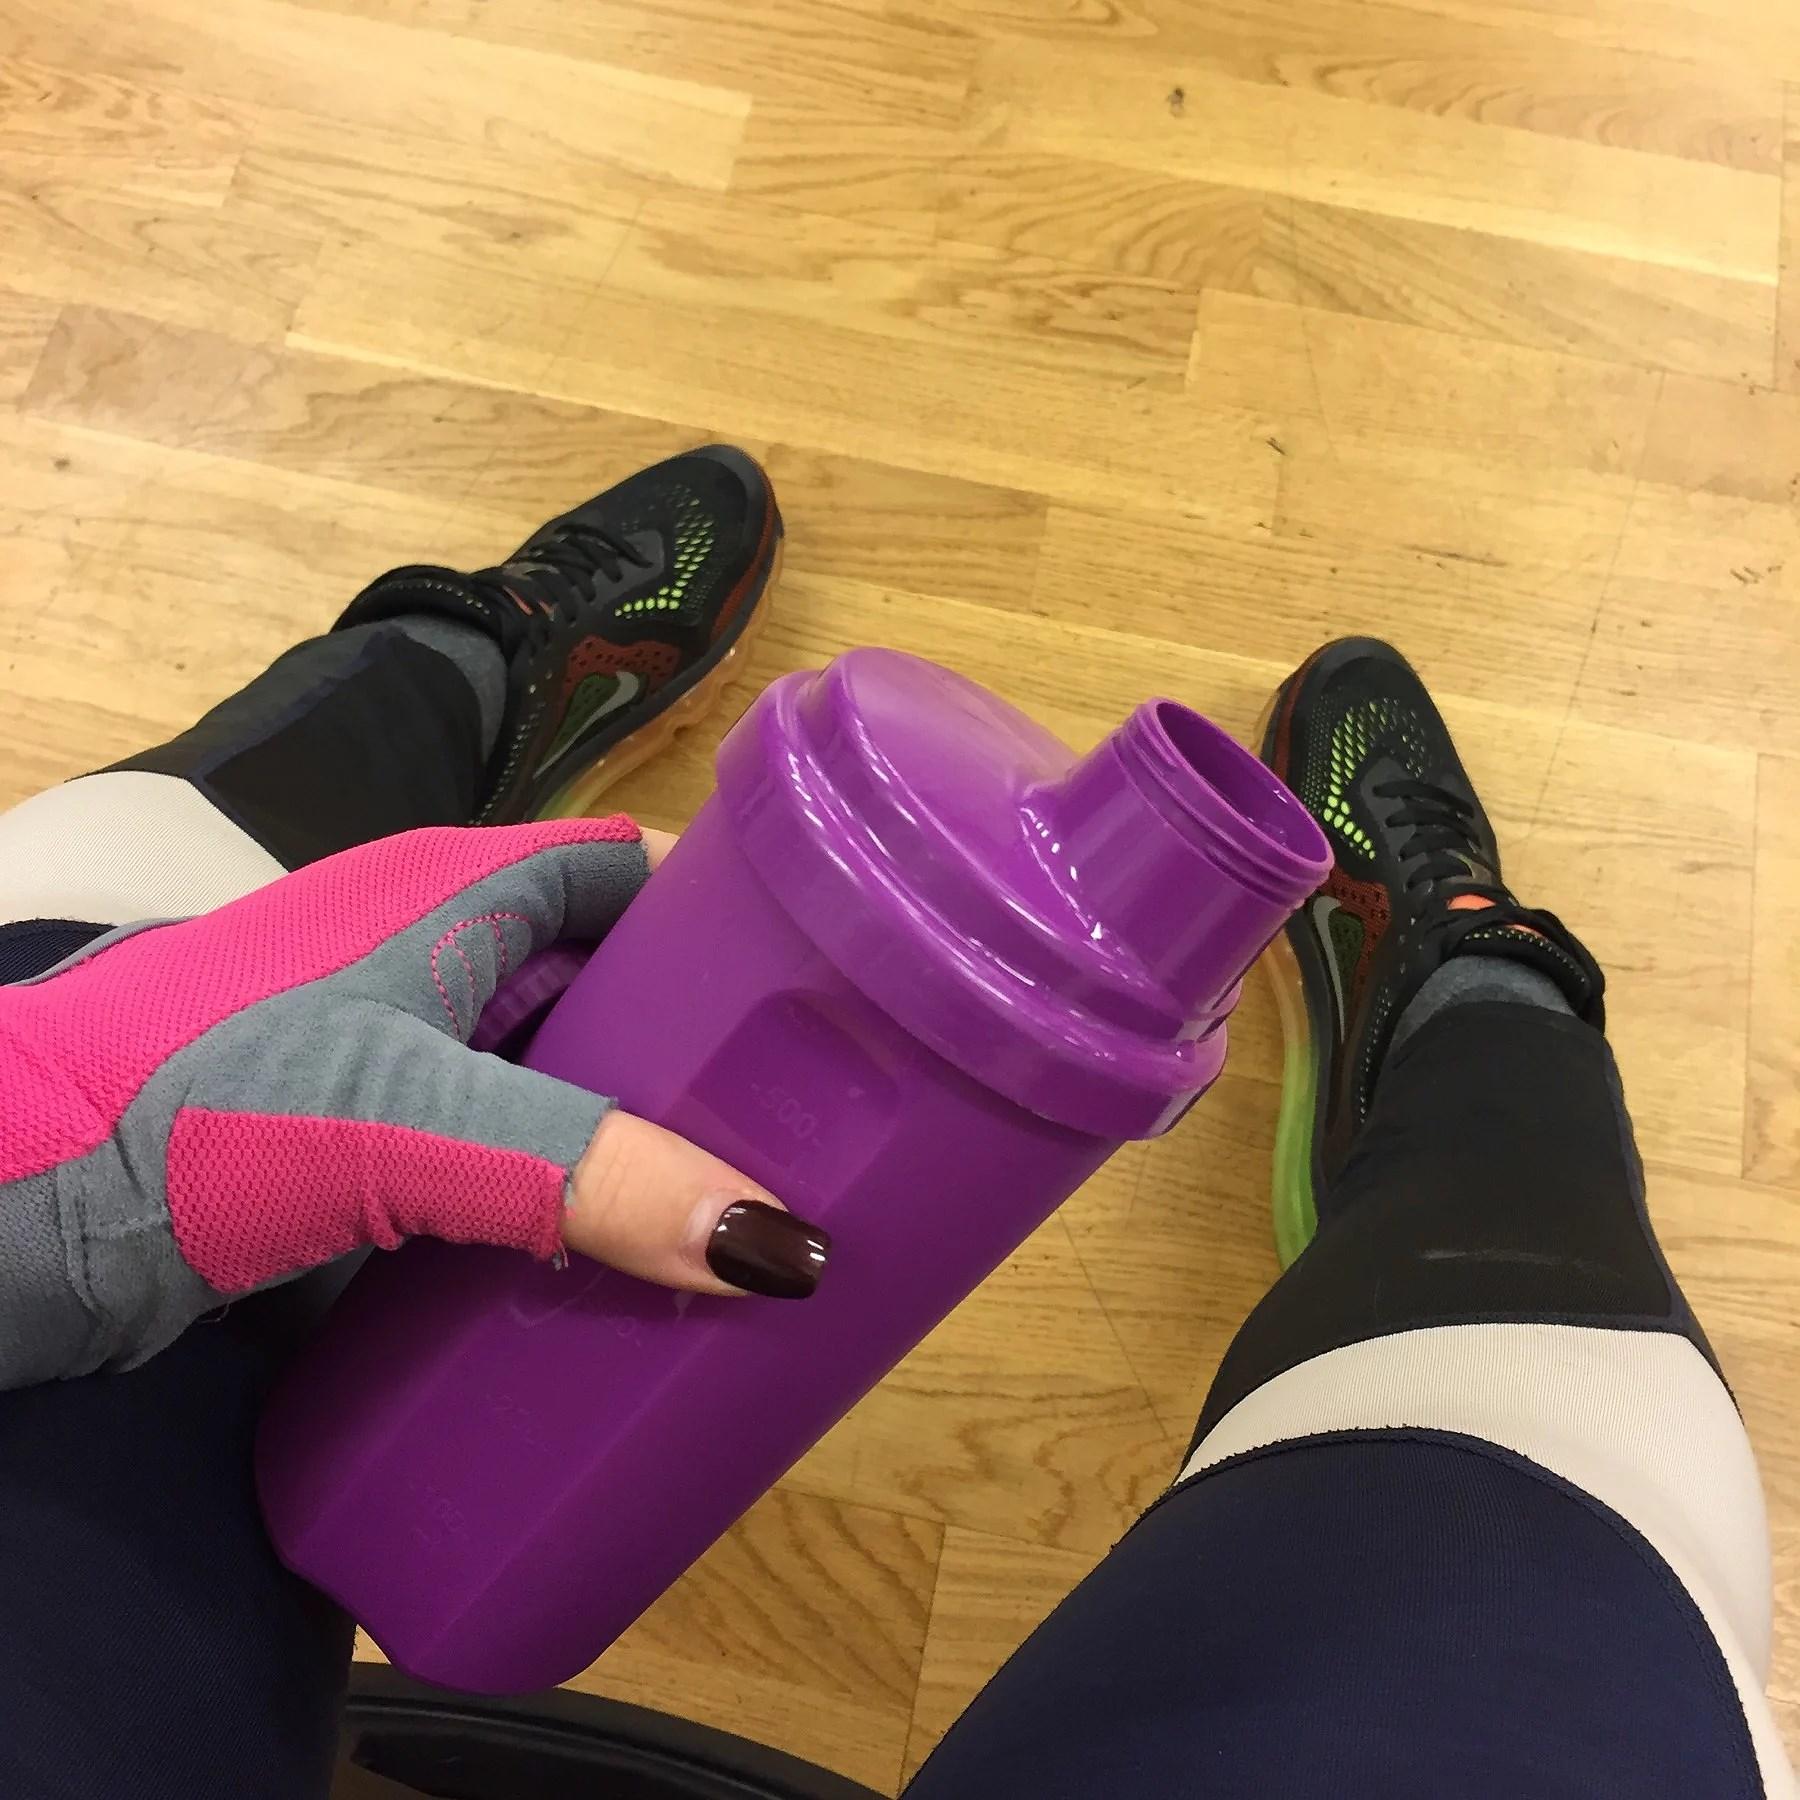 @ the gym